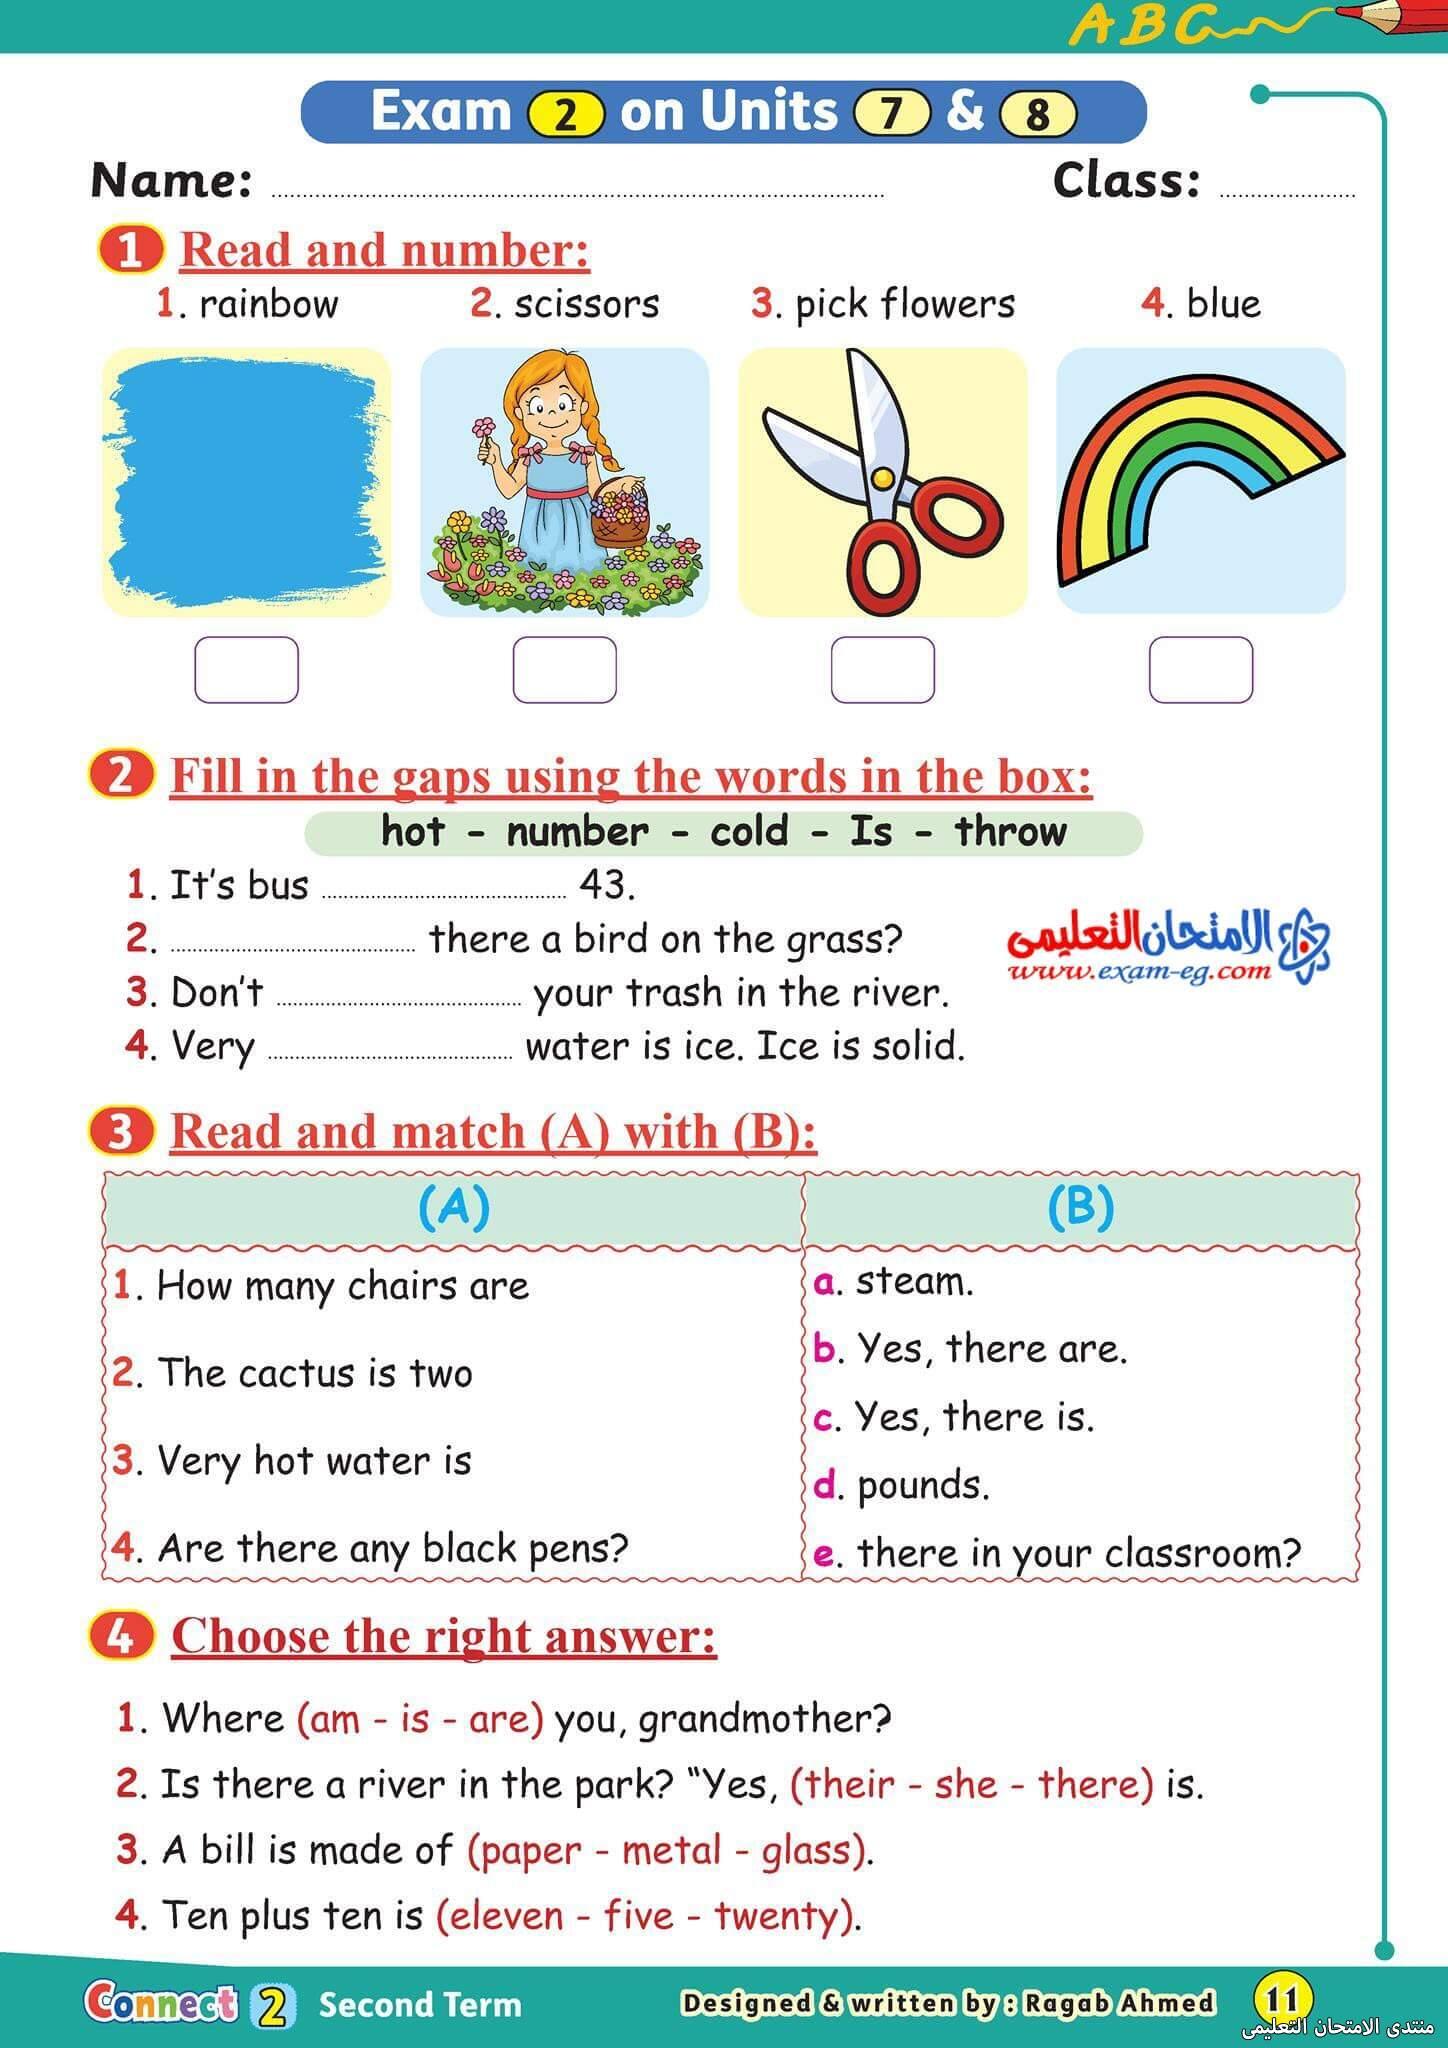 exam-eg.com_1616881781855411.jpg